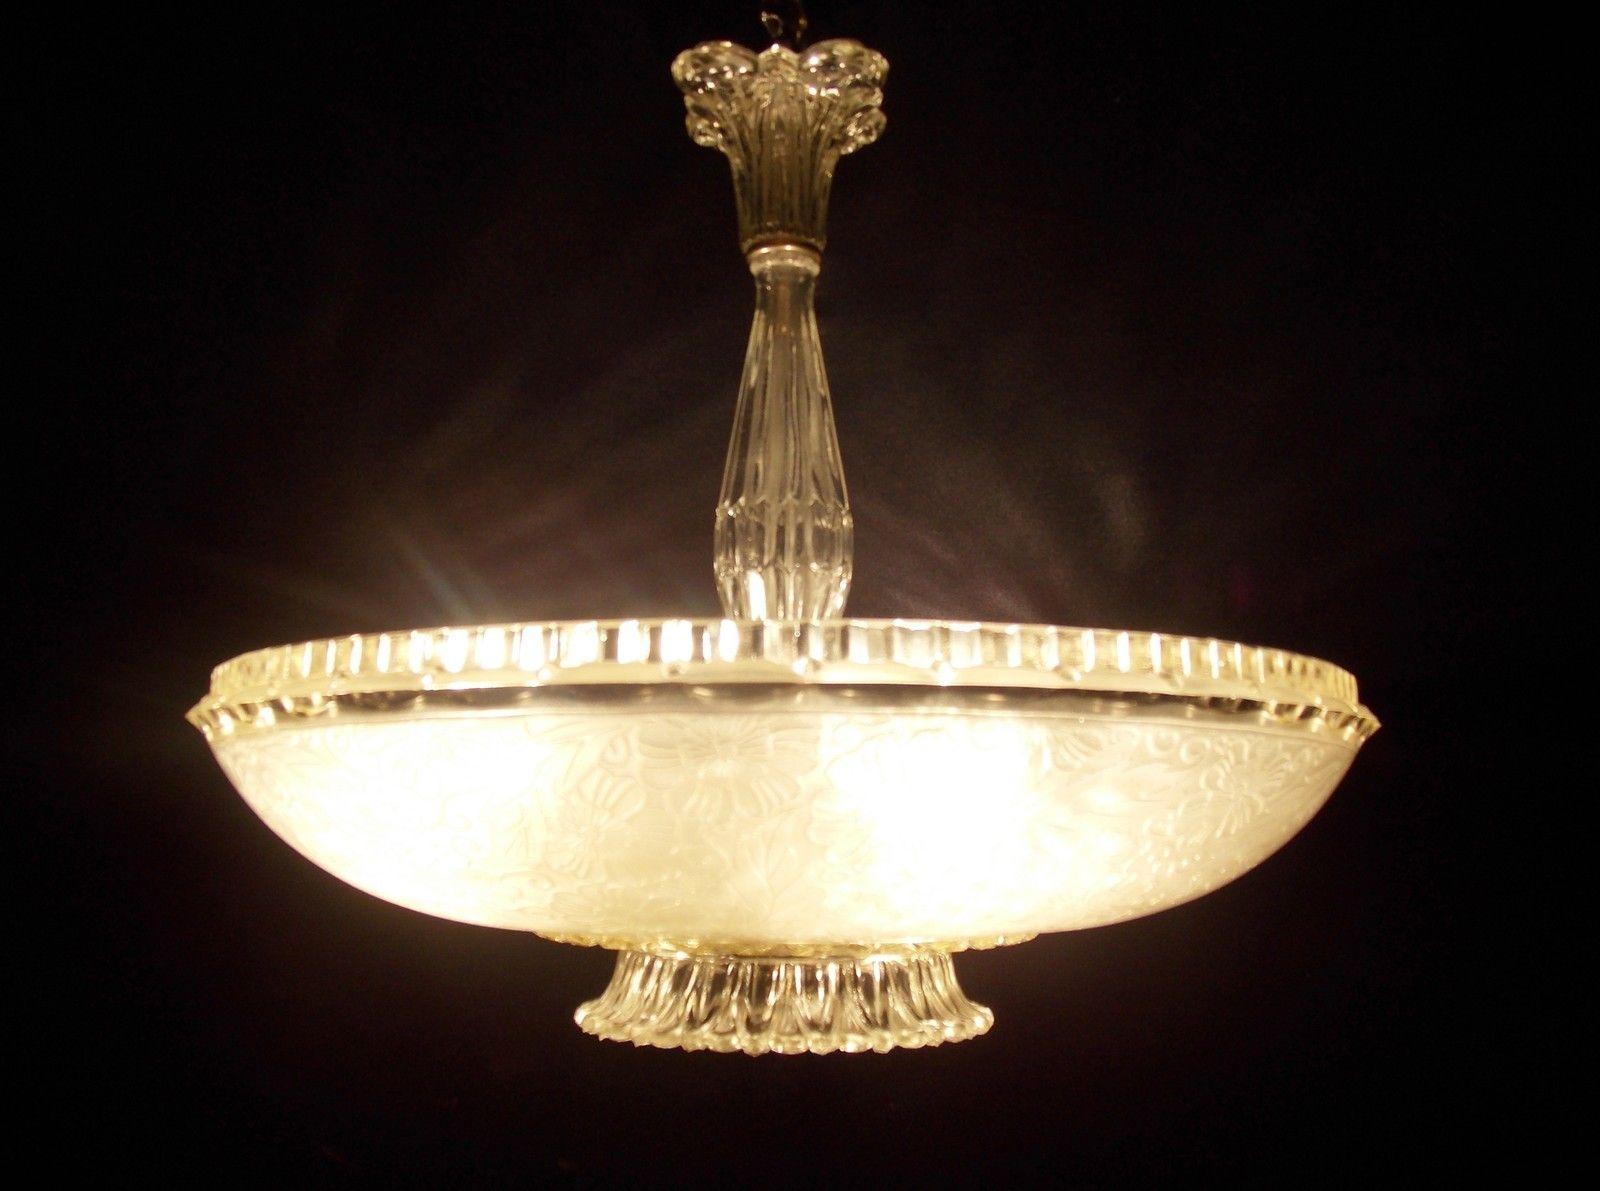 White 1940s art deco glass ceiling light fixture chandelier ebay white 1940s art deco glass ceiling light fixture chandelier ebay aloadofball Gallery